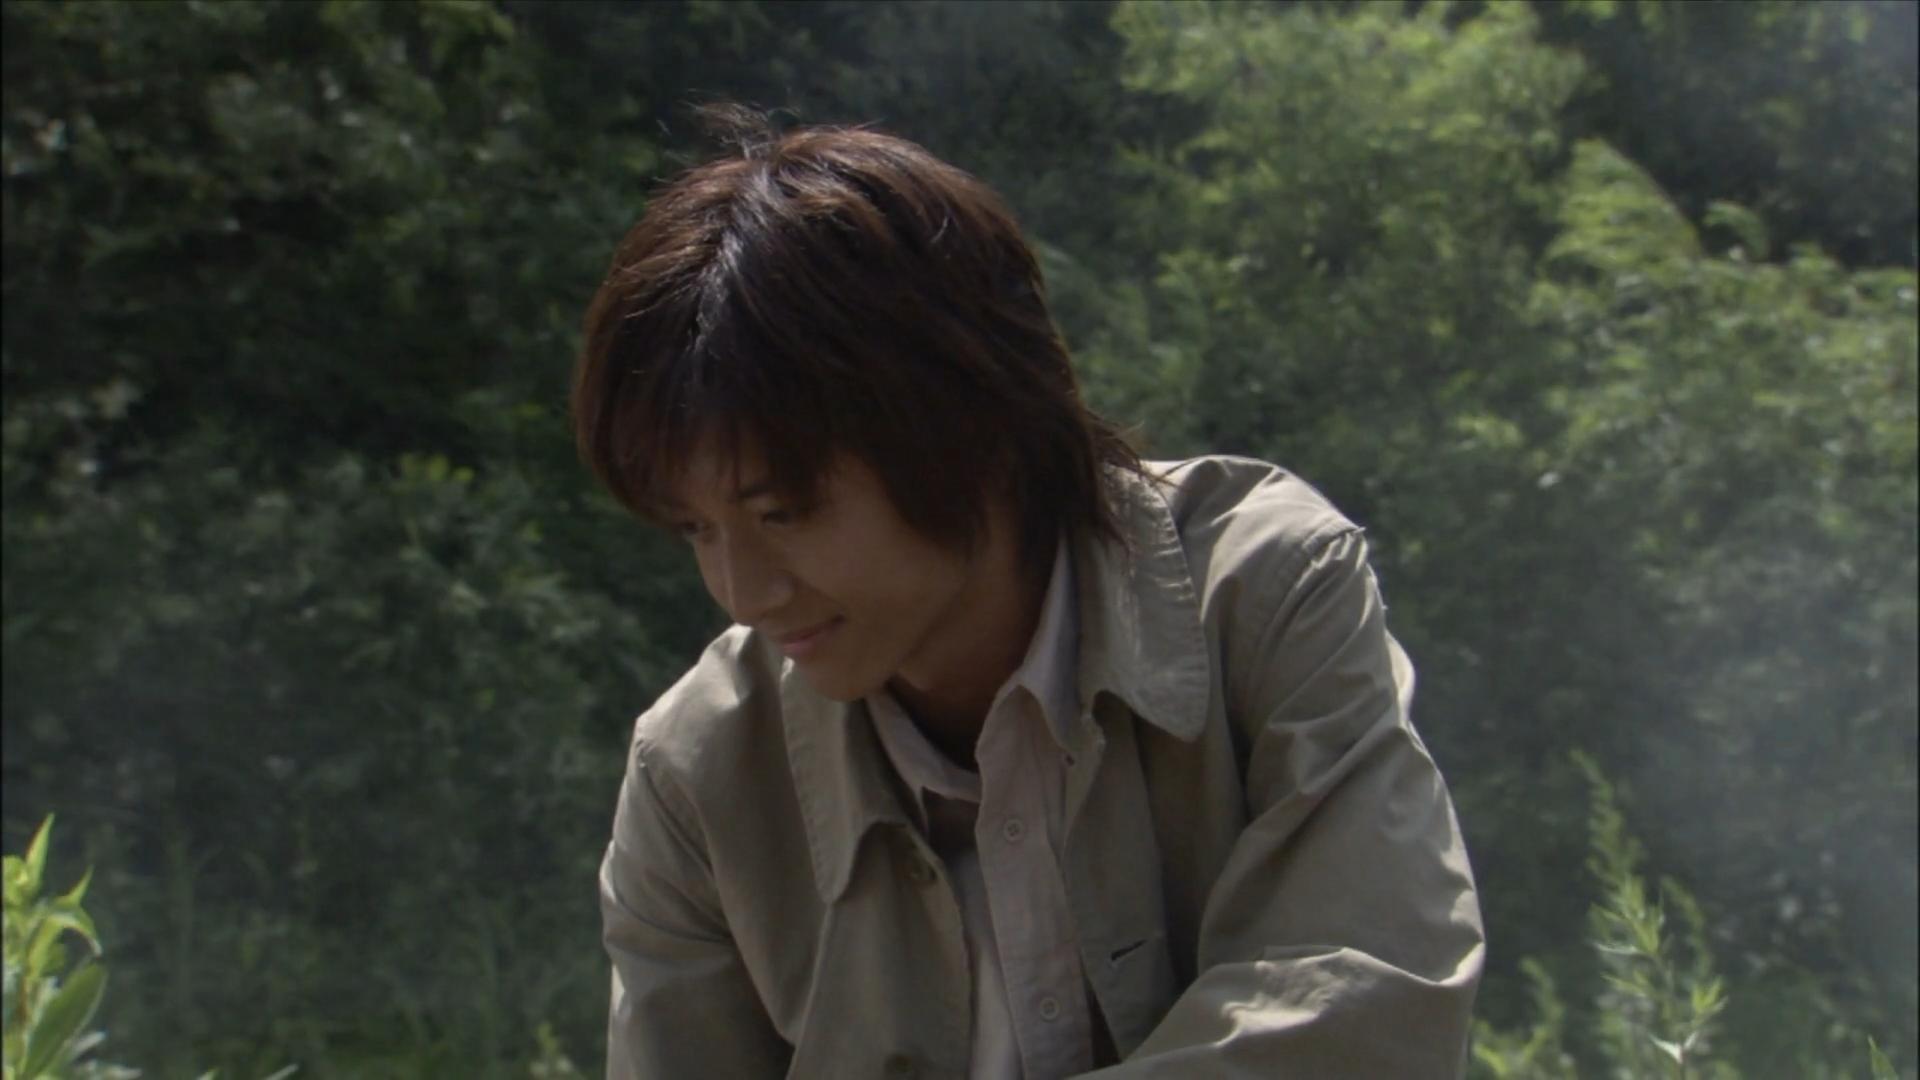 Hajime Aikawa/Missing Ace